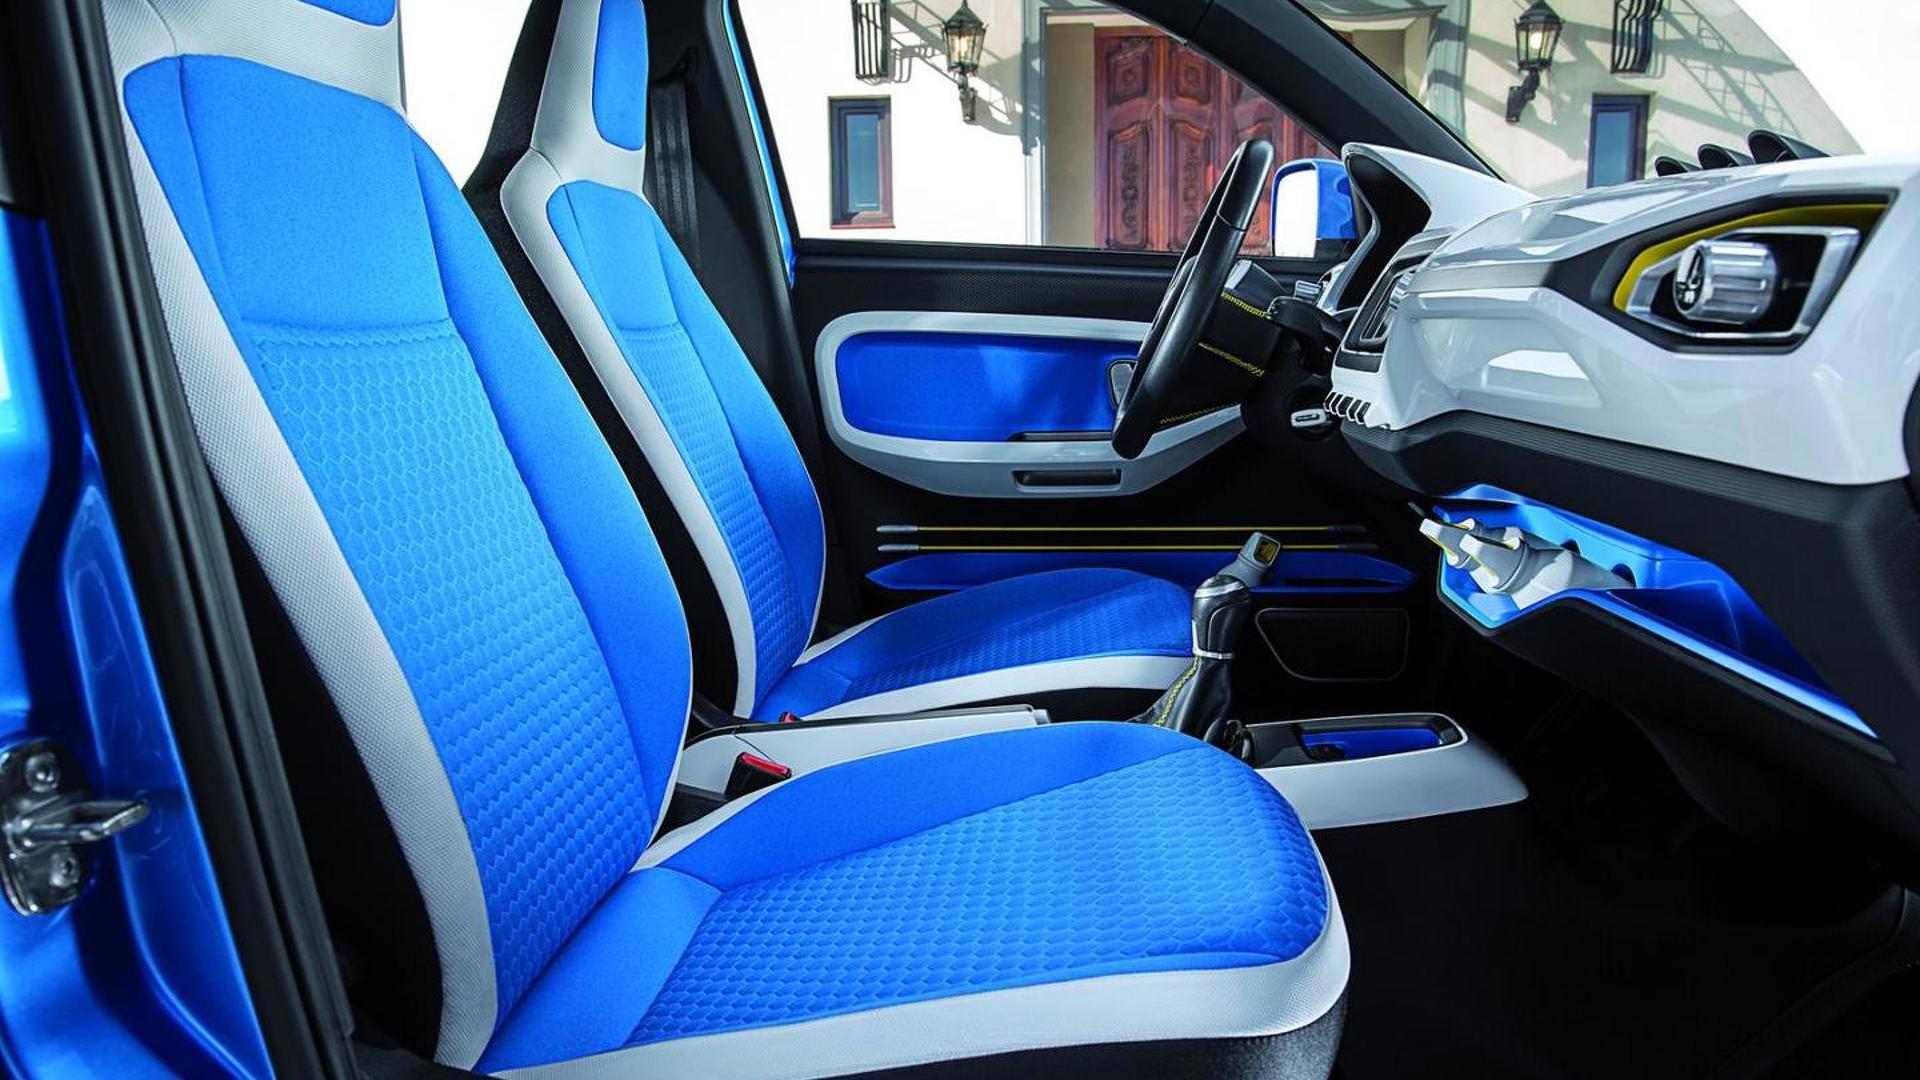 2013 398336 volkswagen taigun concept 24 07 20131